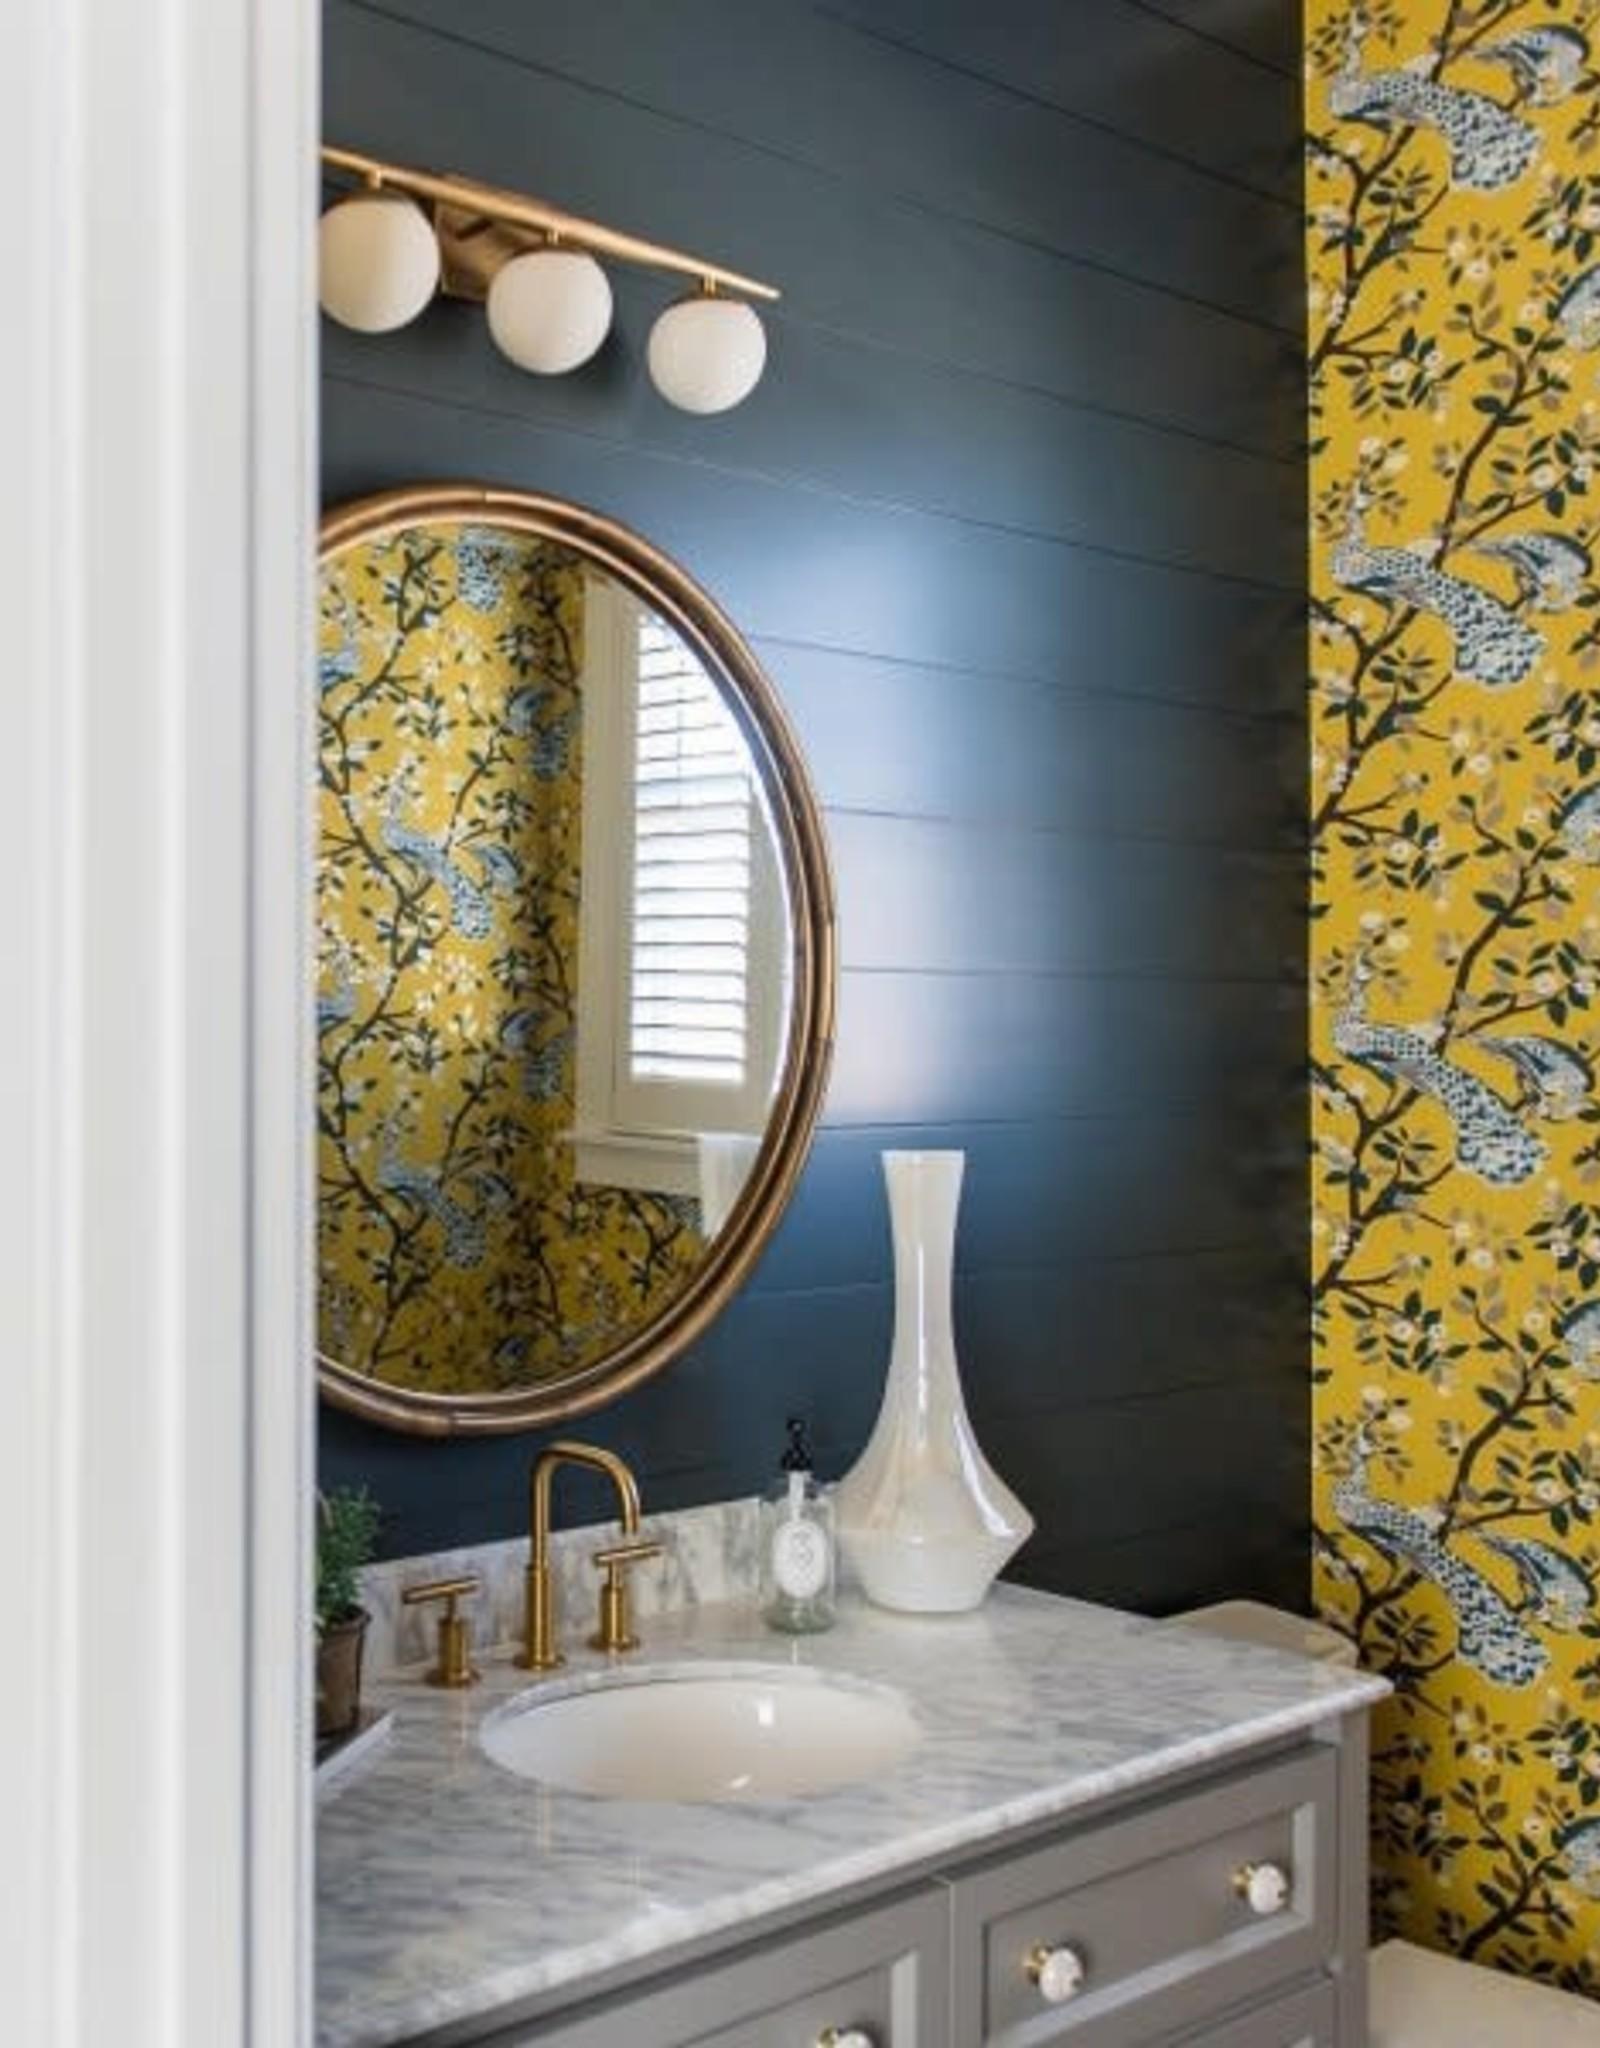 Kohler Kohler Compass Undermount/Drop-in Bathroom Sink White